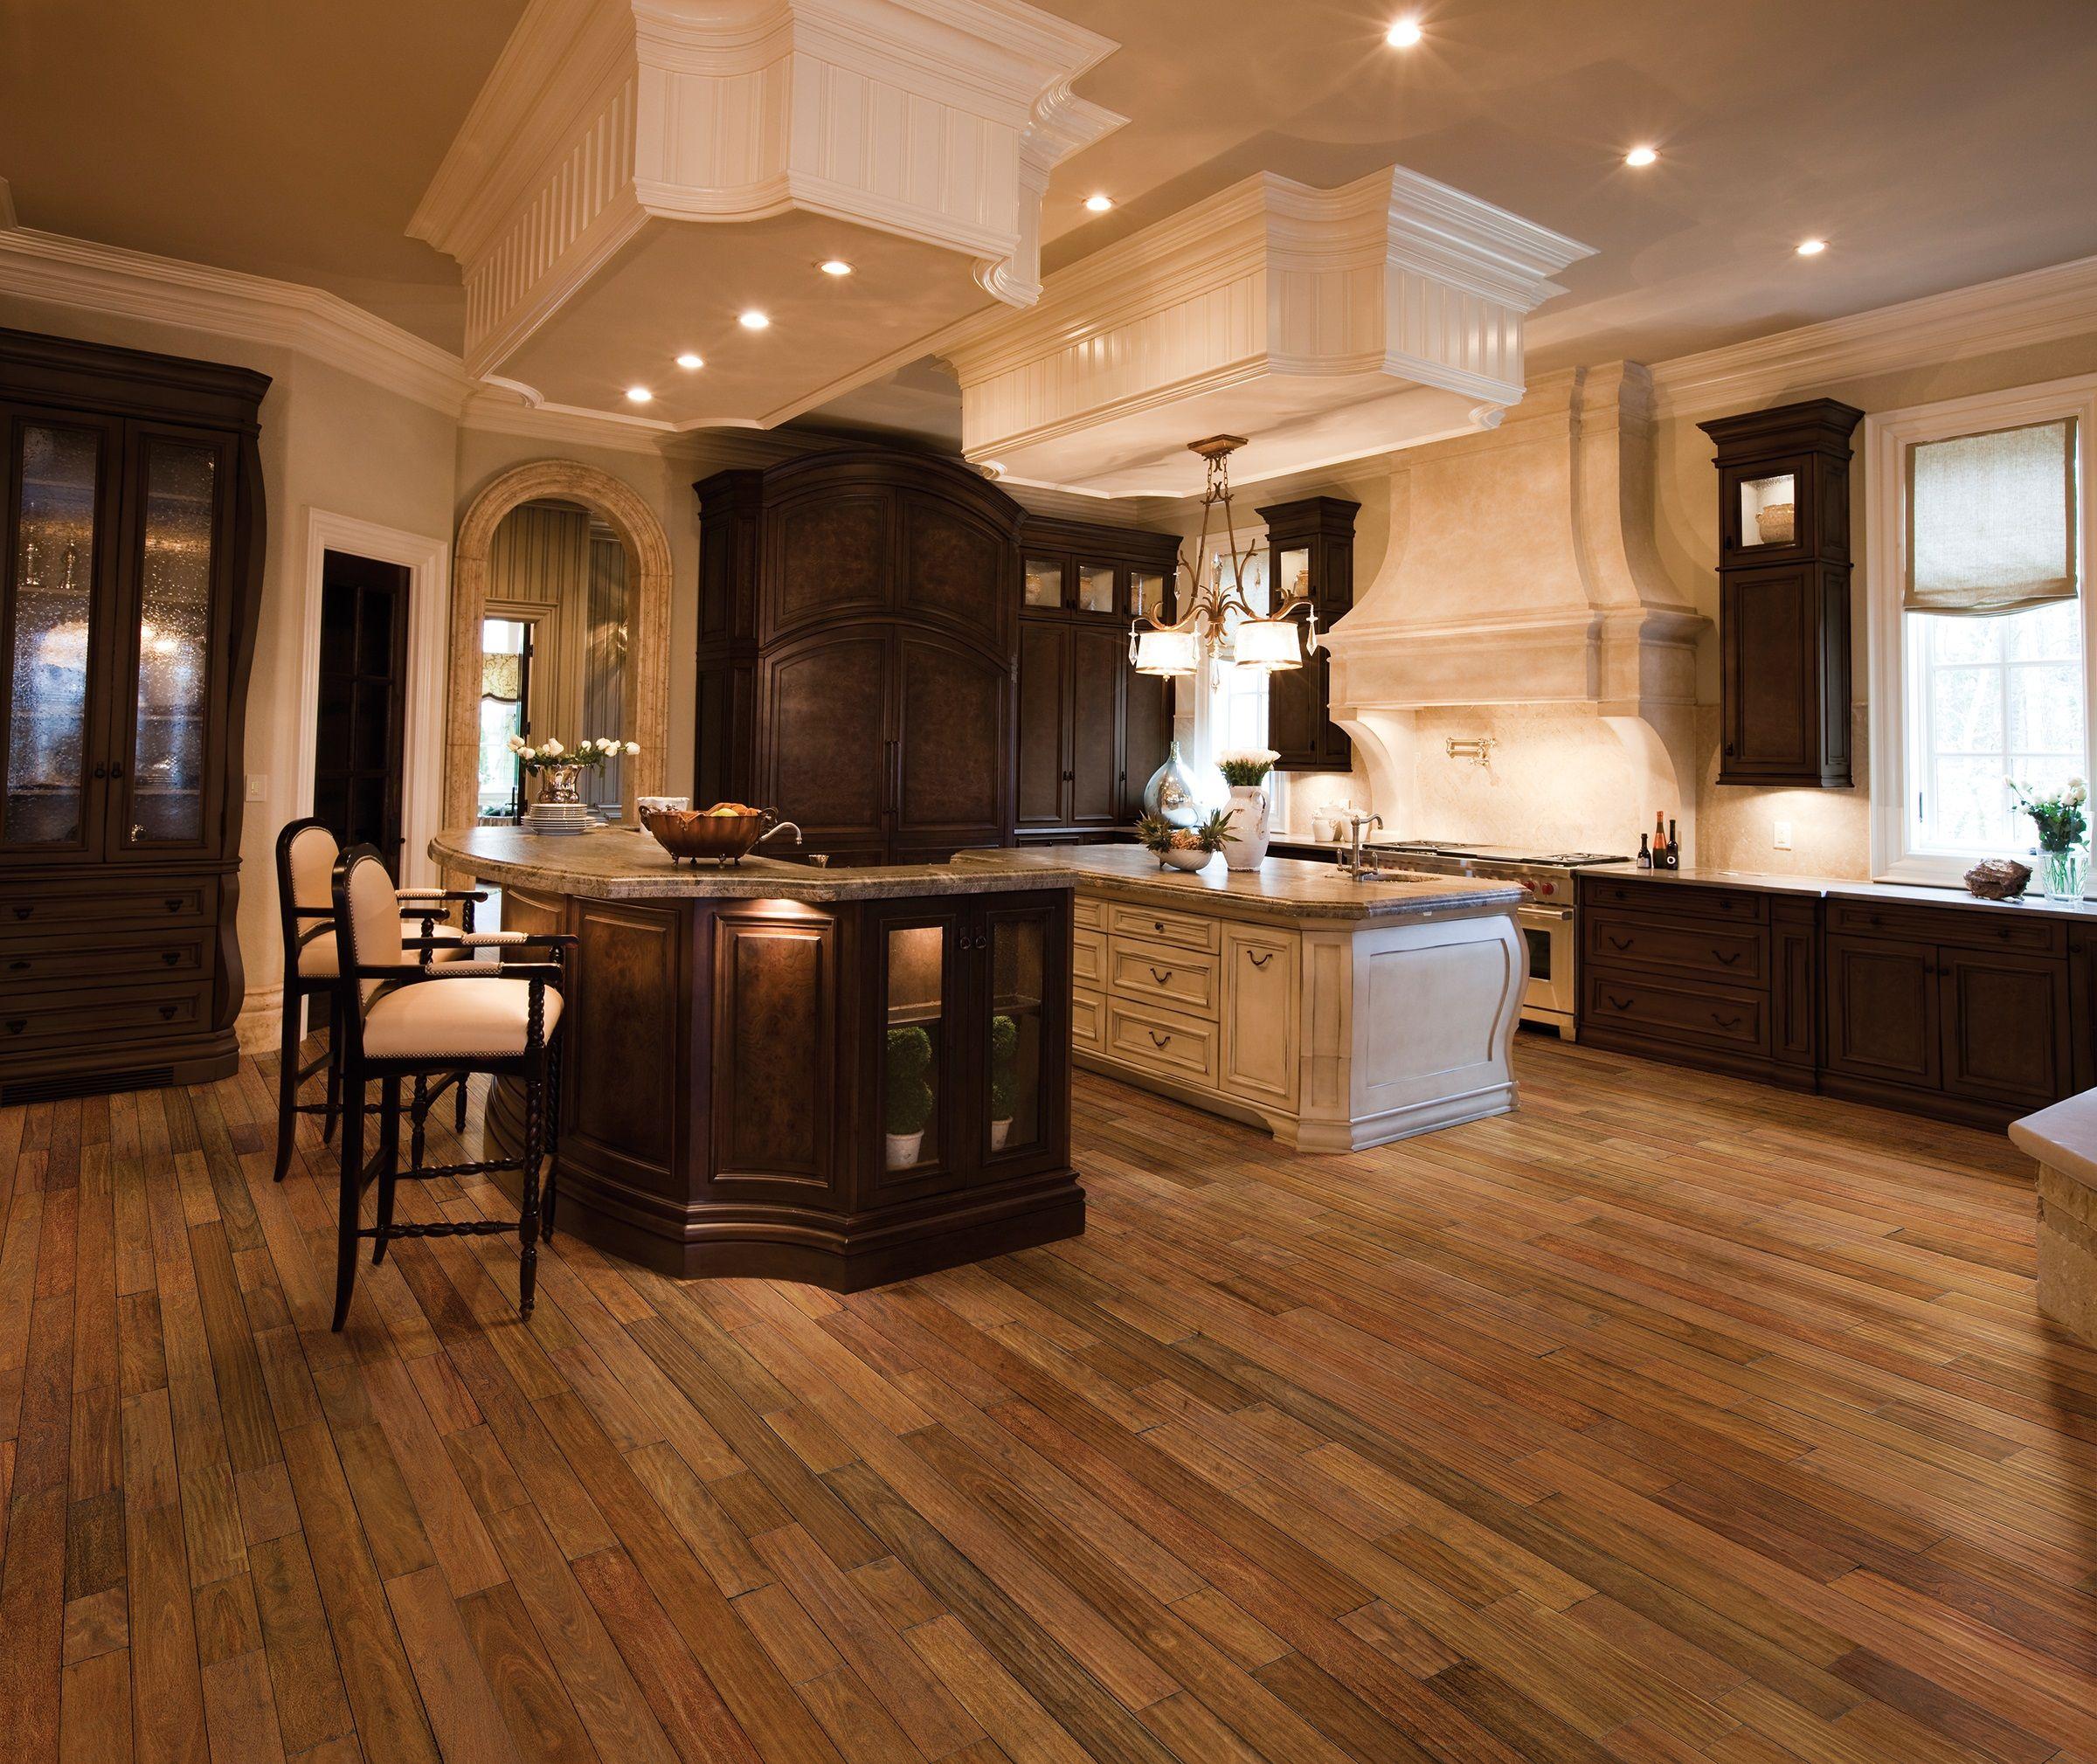 Brazilian Amendoim Natural Hand Scraped Engineered Hardwood Floor Decor Home Engineered Hardwood Floor Decor